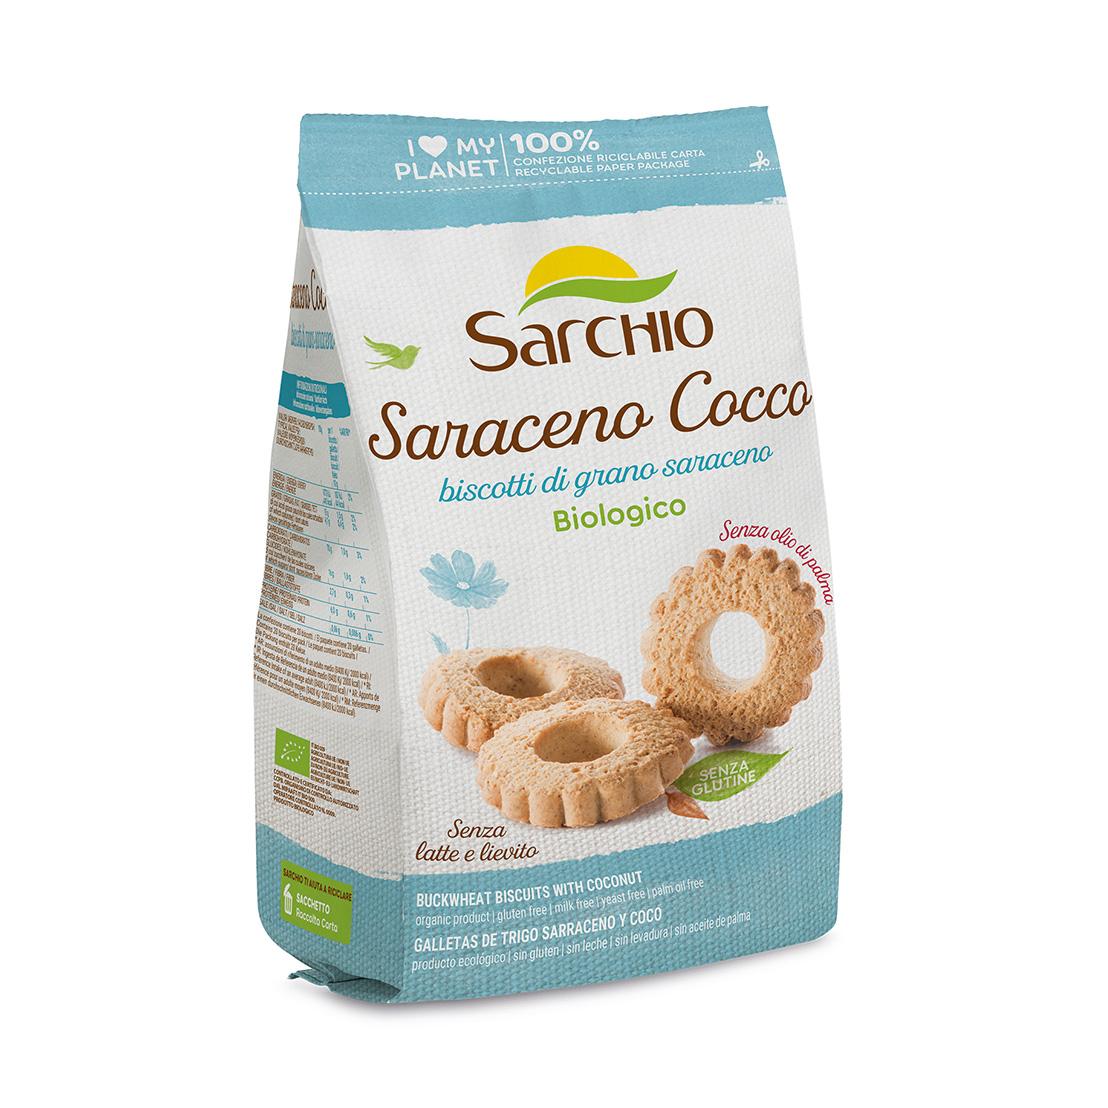 Saraceno Cocco